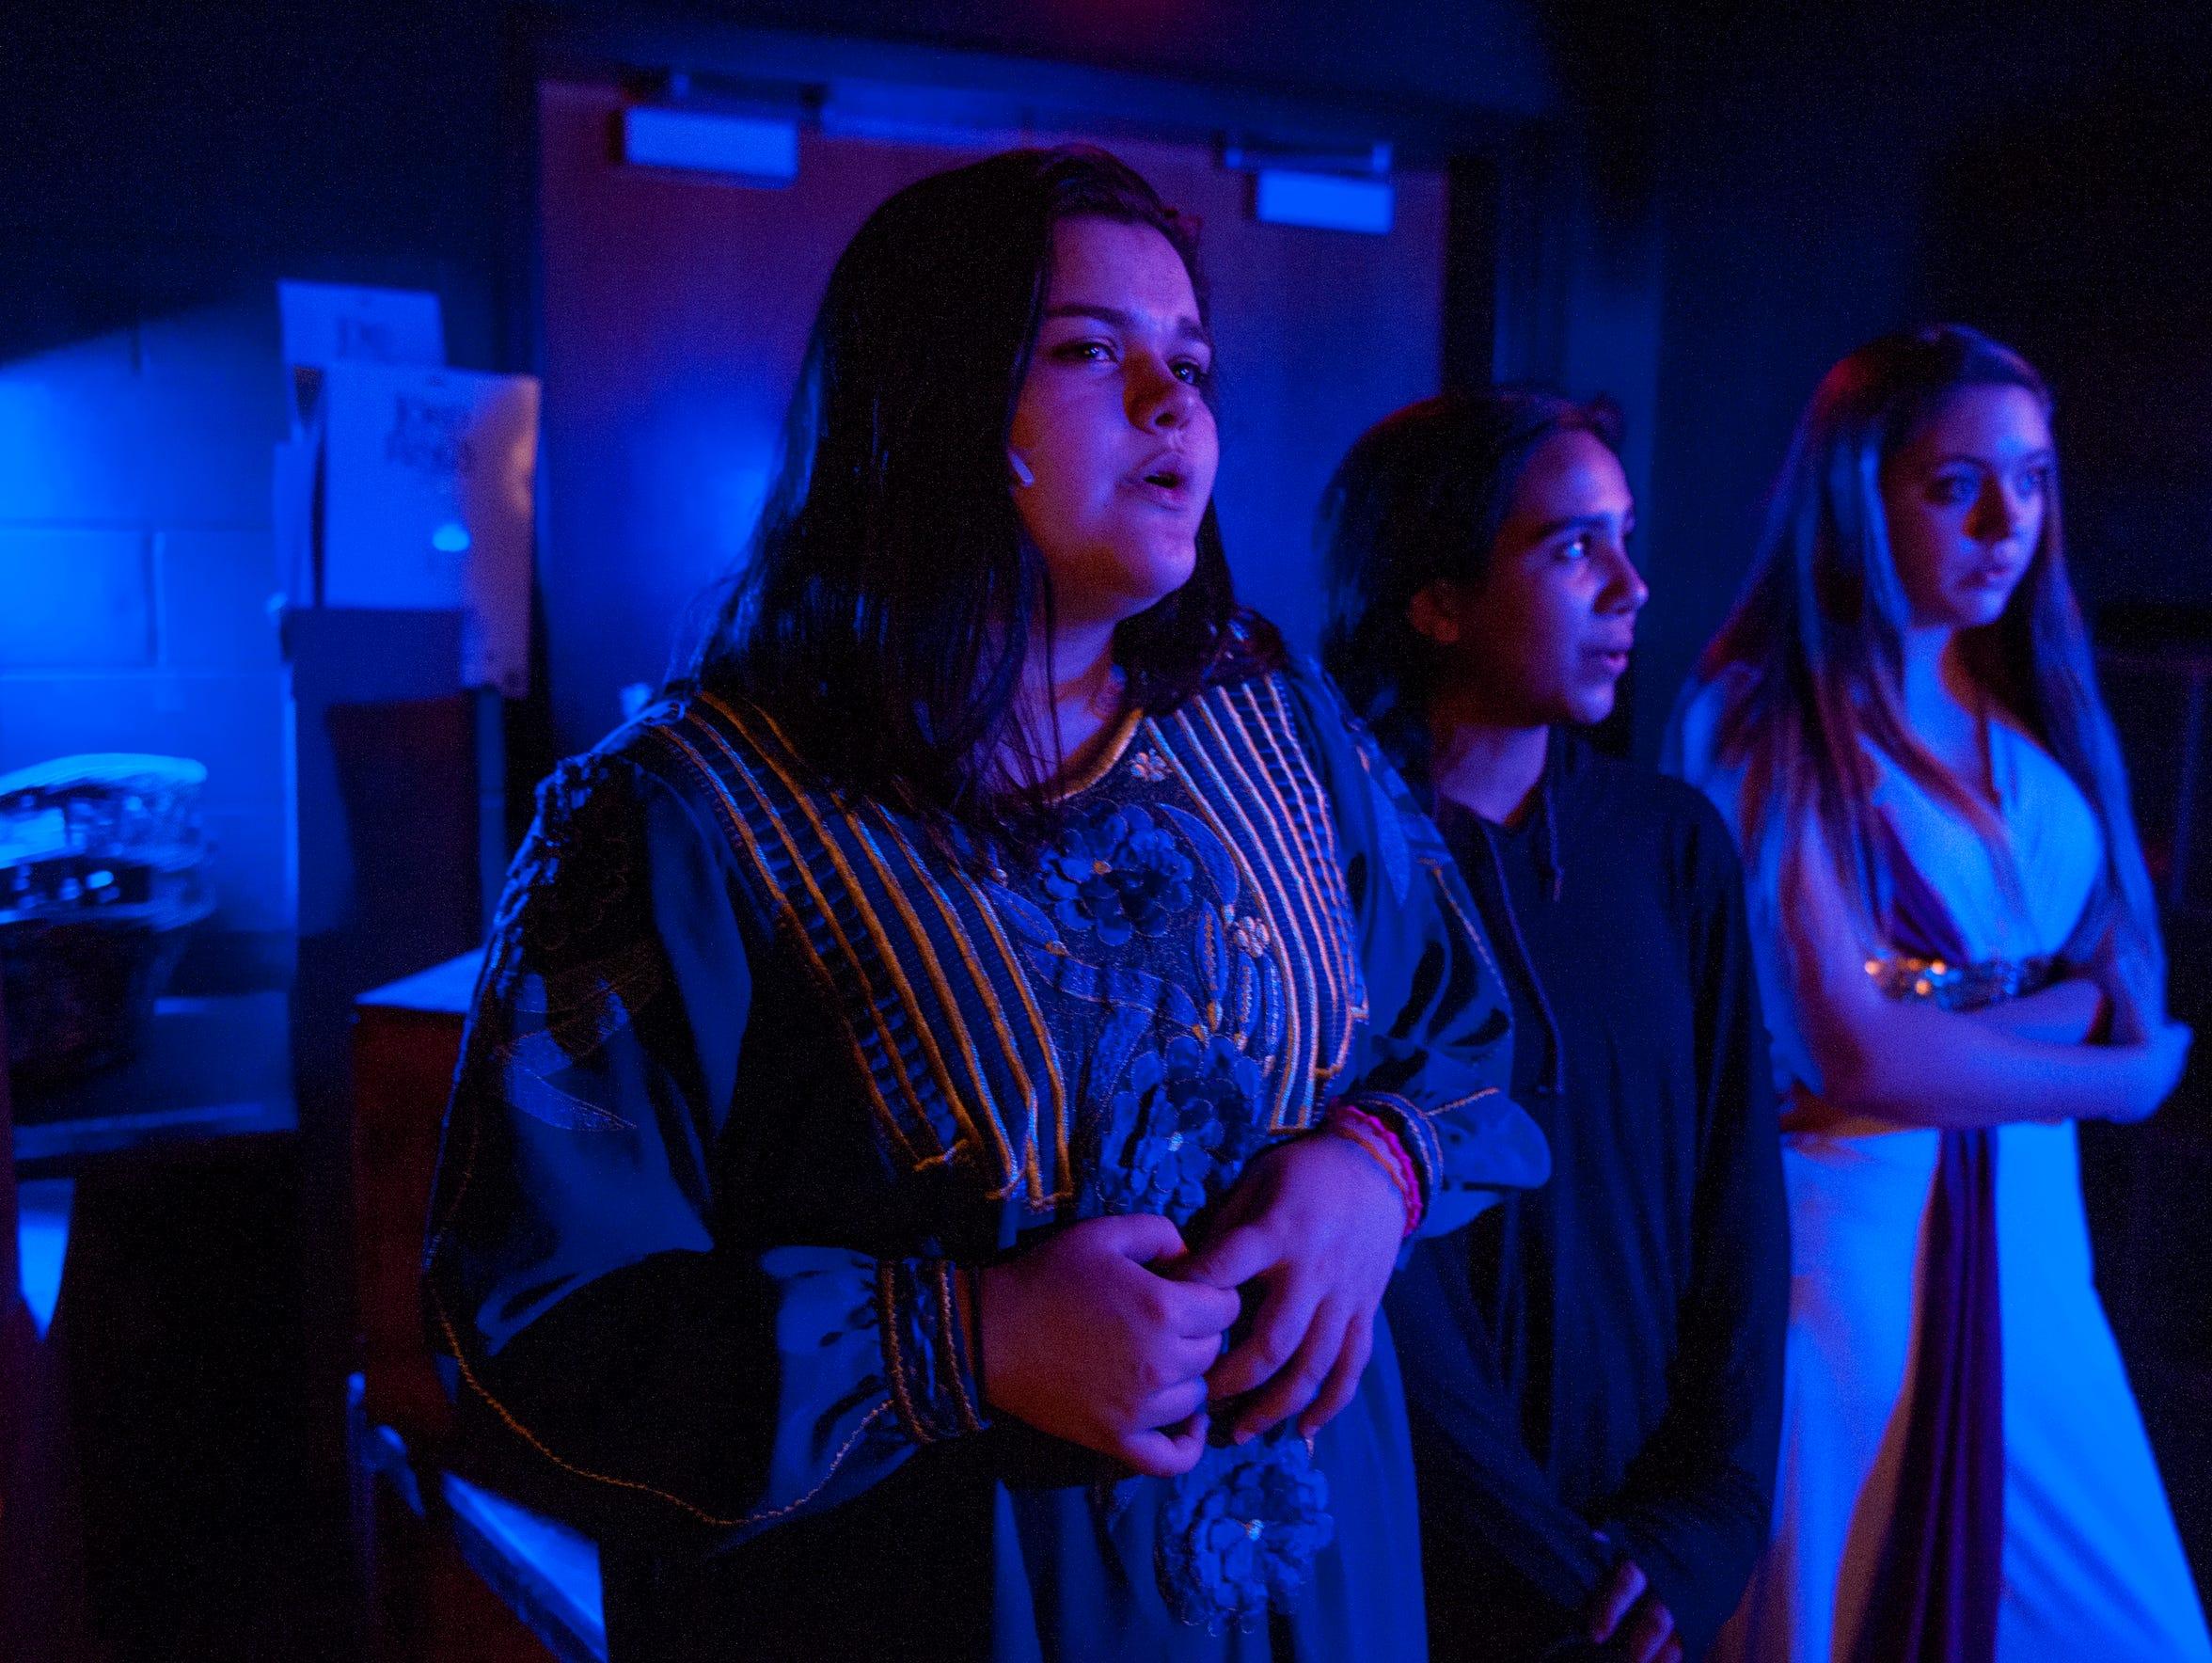 Lenape High School student Aniela Mazzola (left) sings